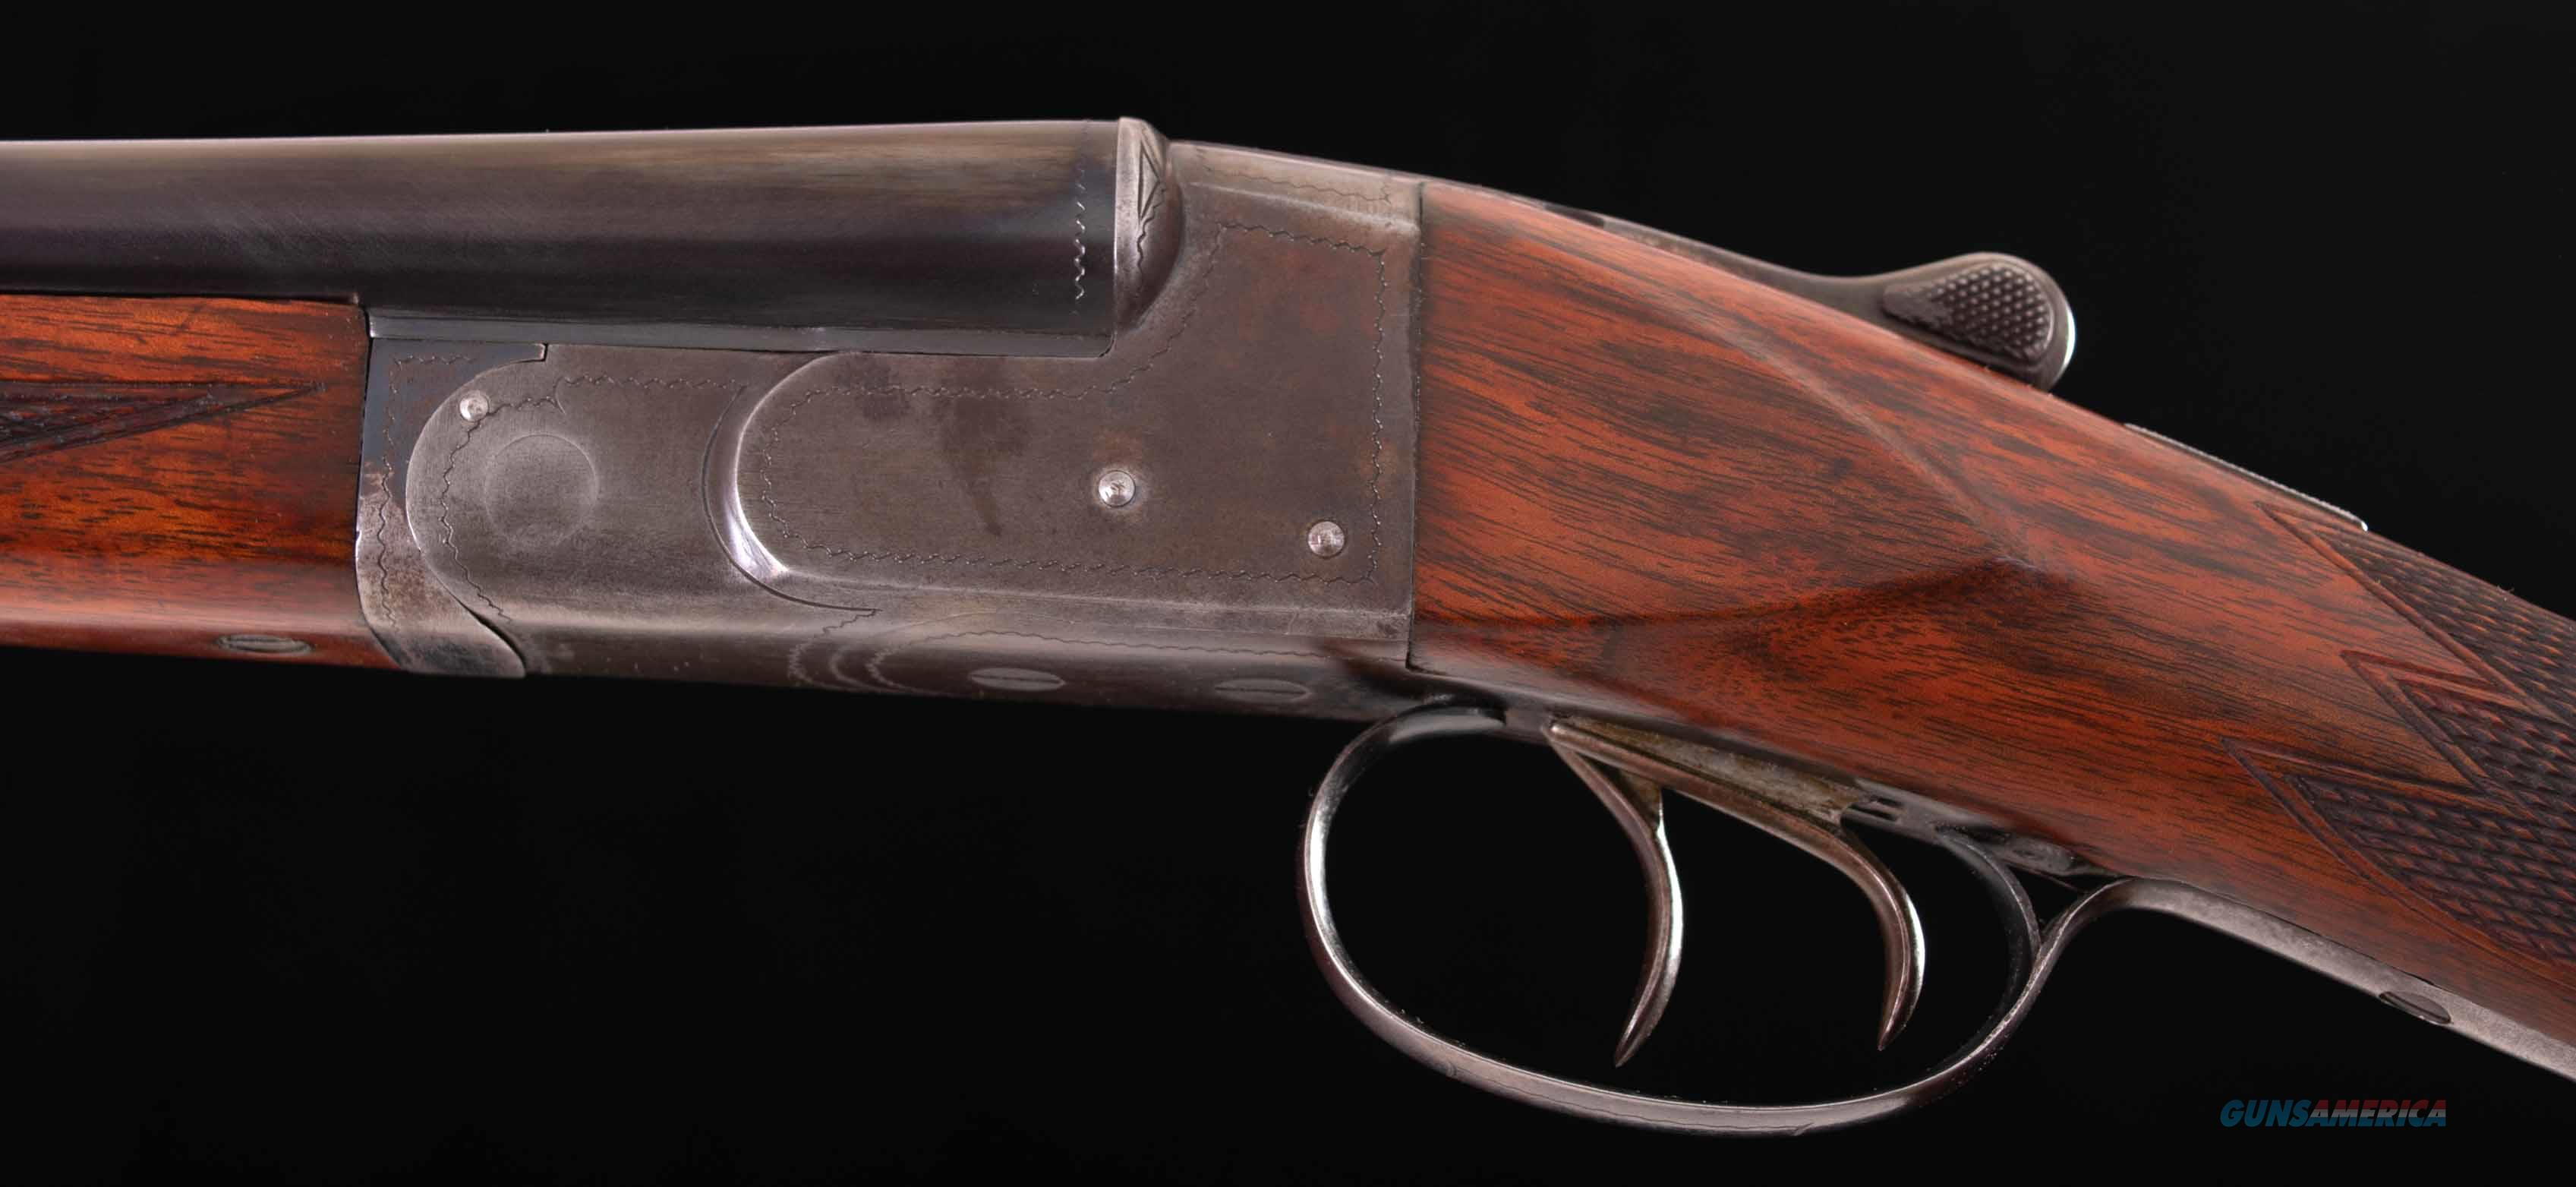 Ithaca NID 28 Gauge – FACTORY ENGLISH STOCK, RARE! vintage firearms inc